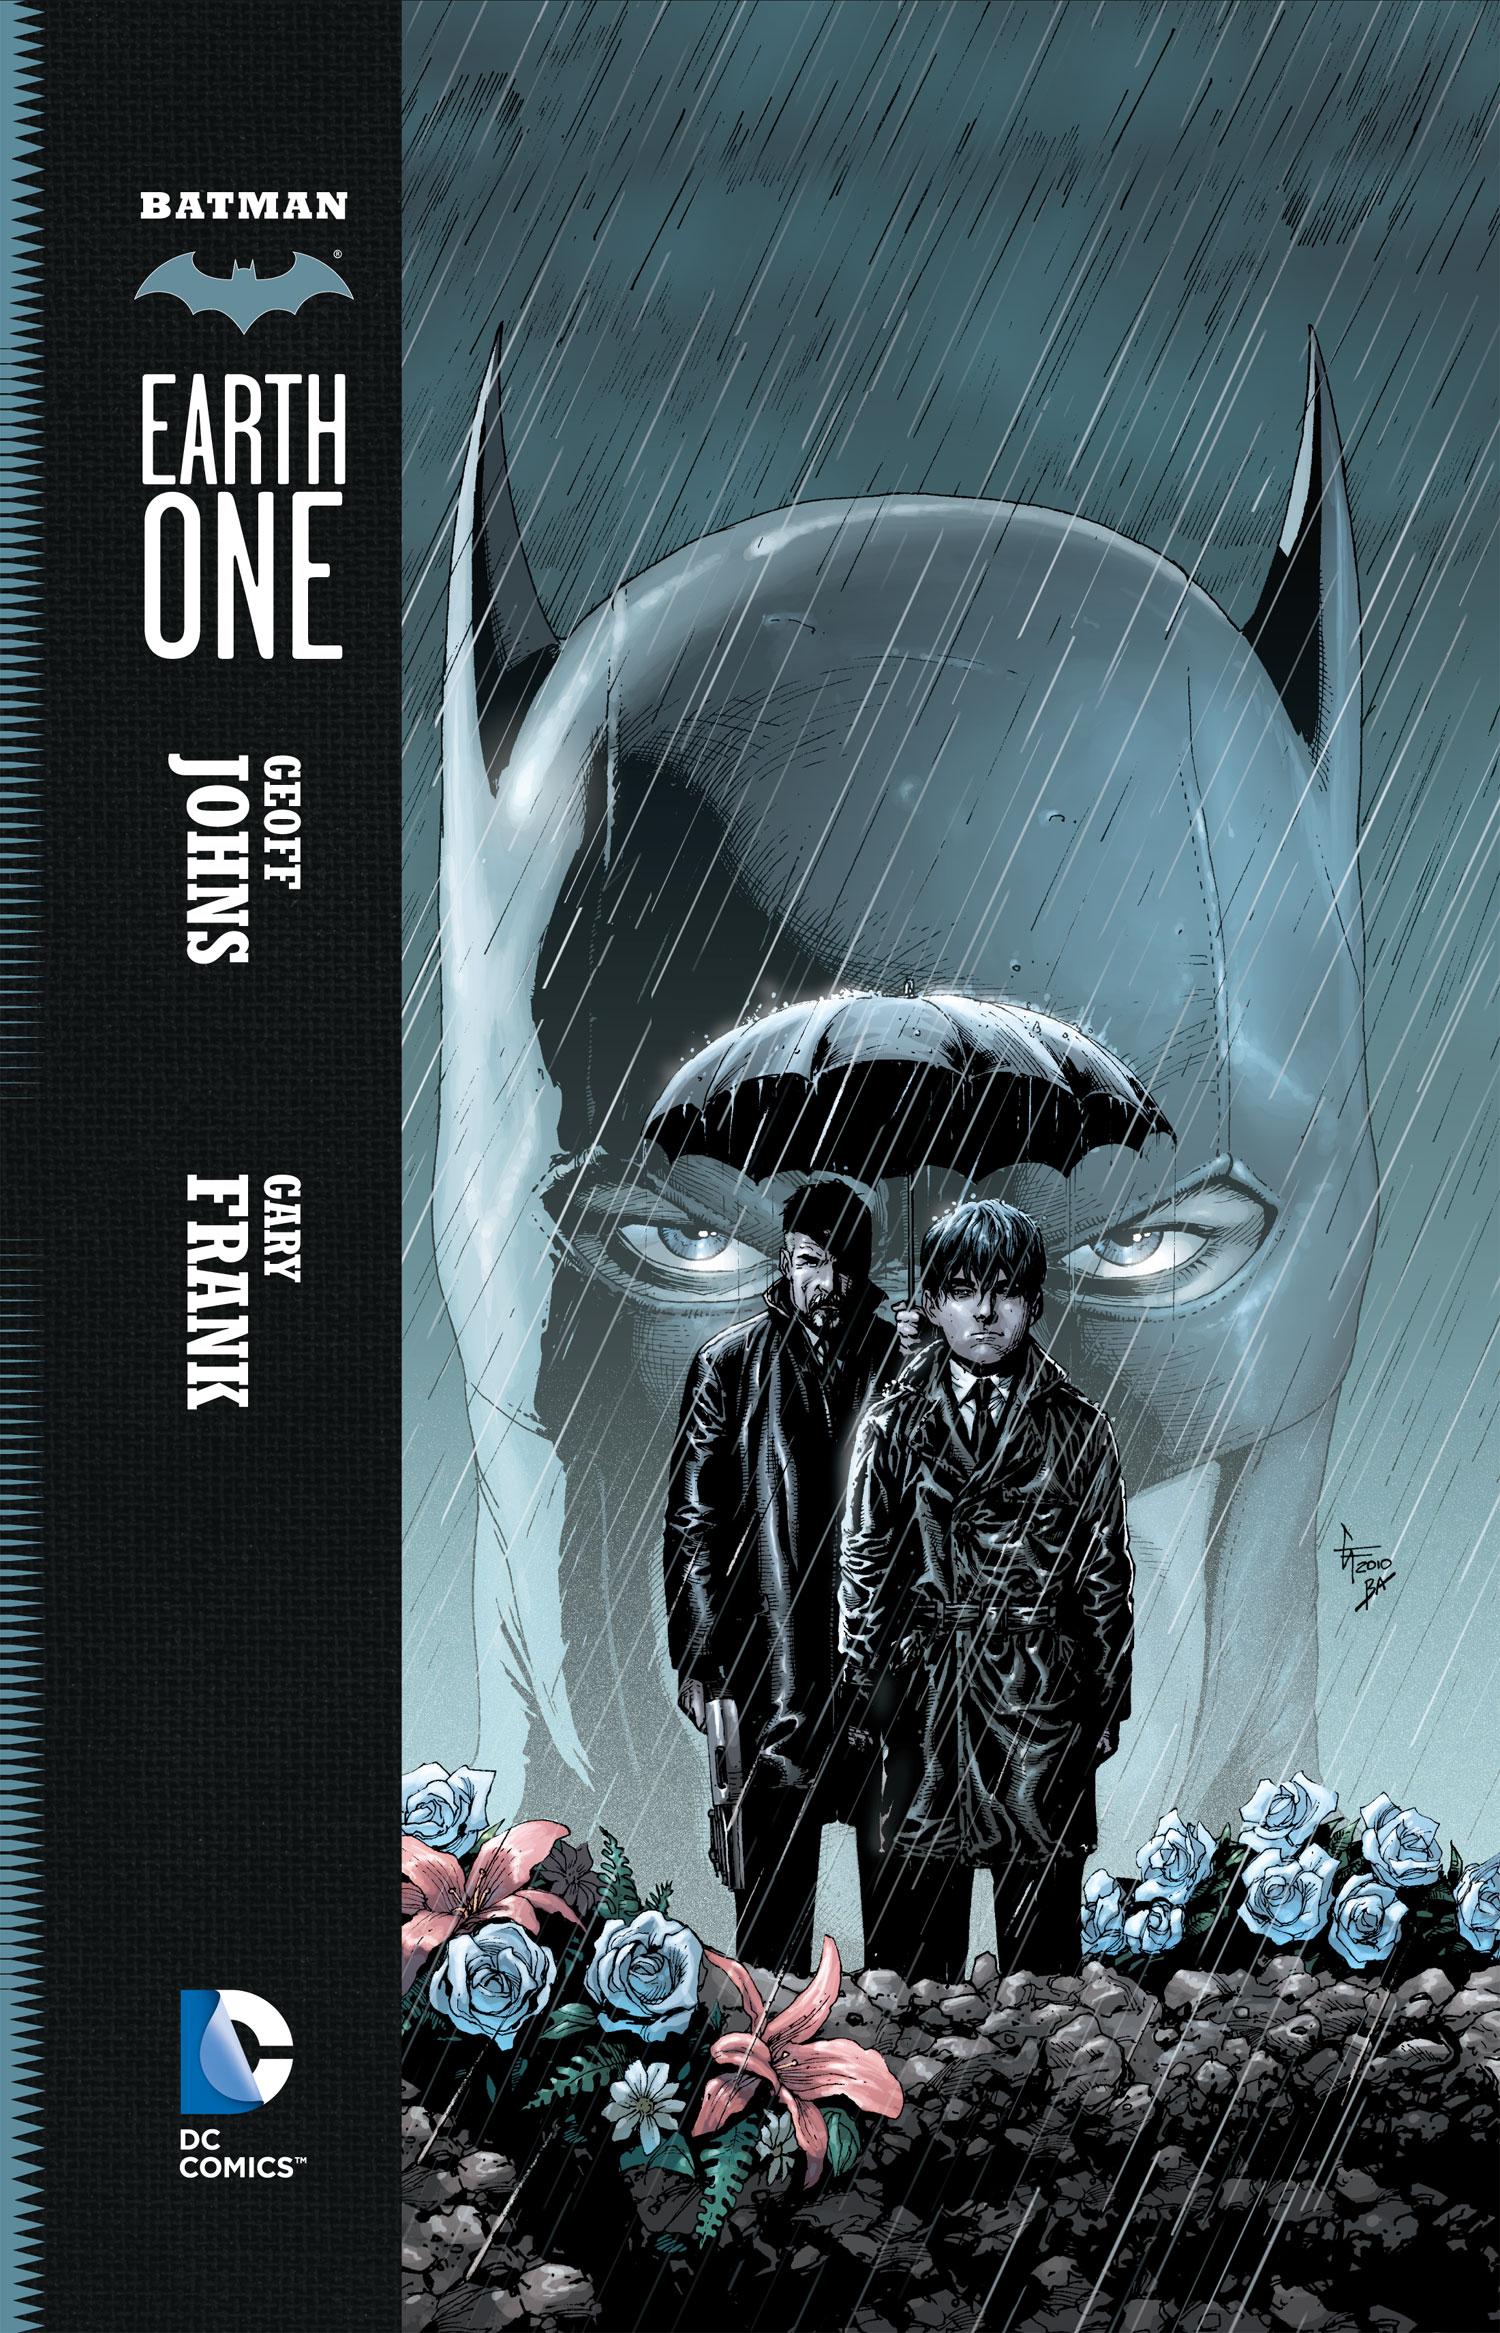 'Batman: Earth One' Cover by Gary Frank & Brad Anderson